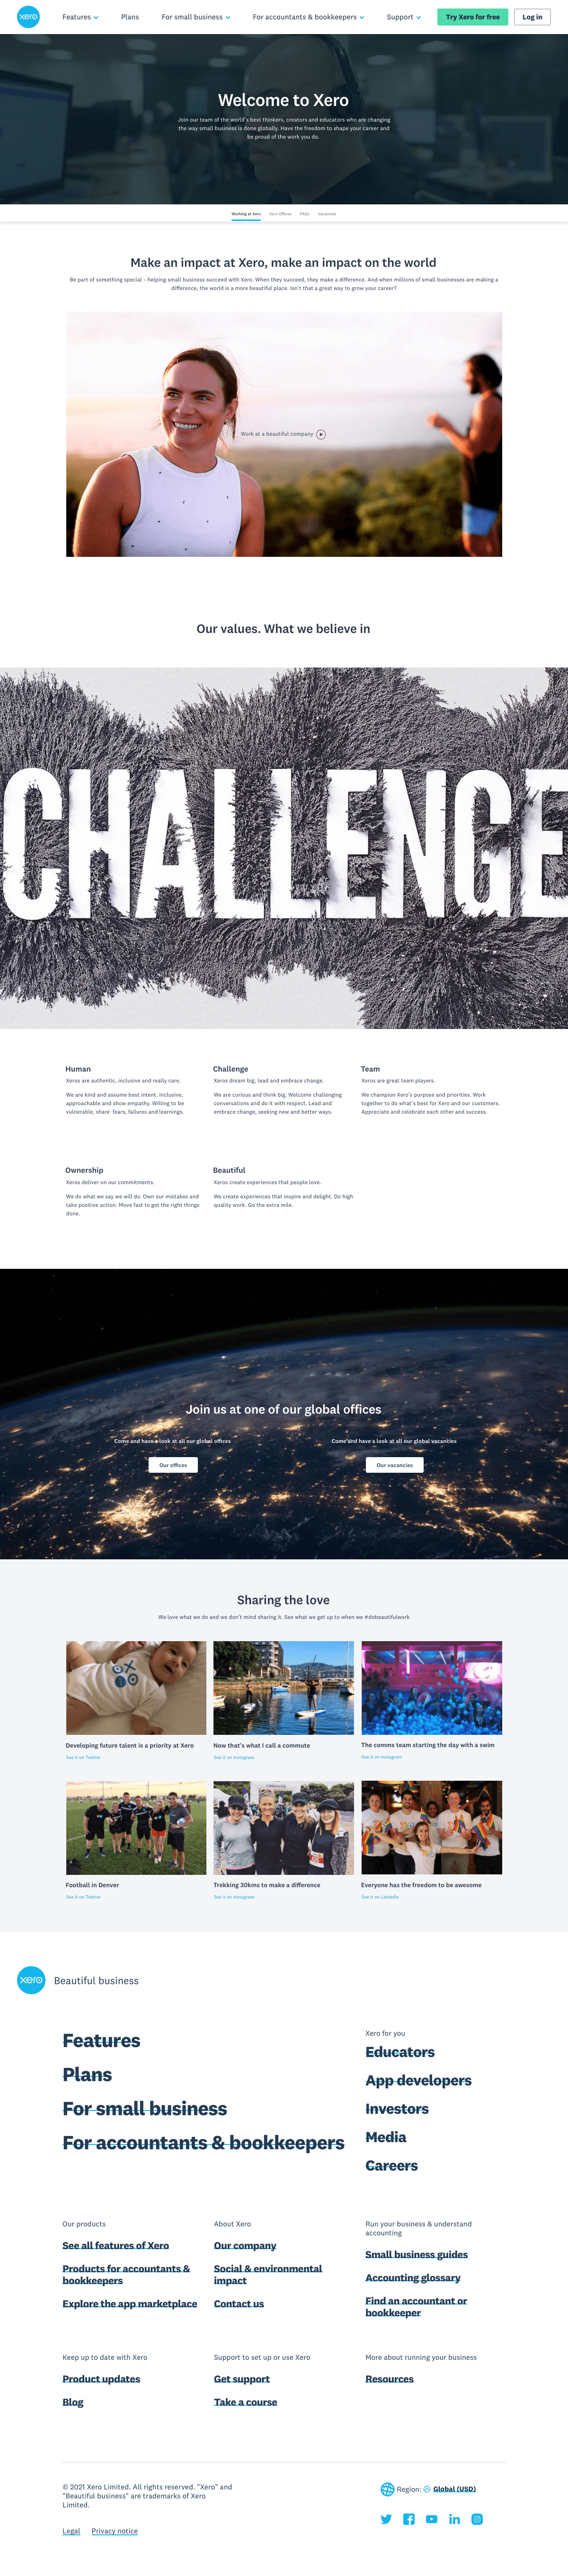 Xero – Careers page